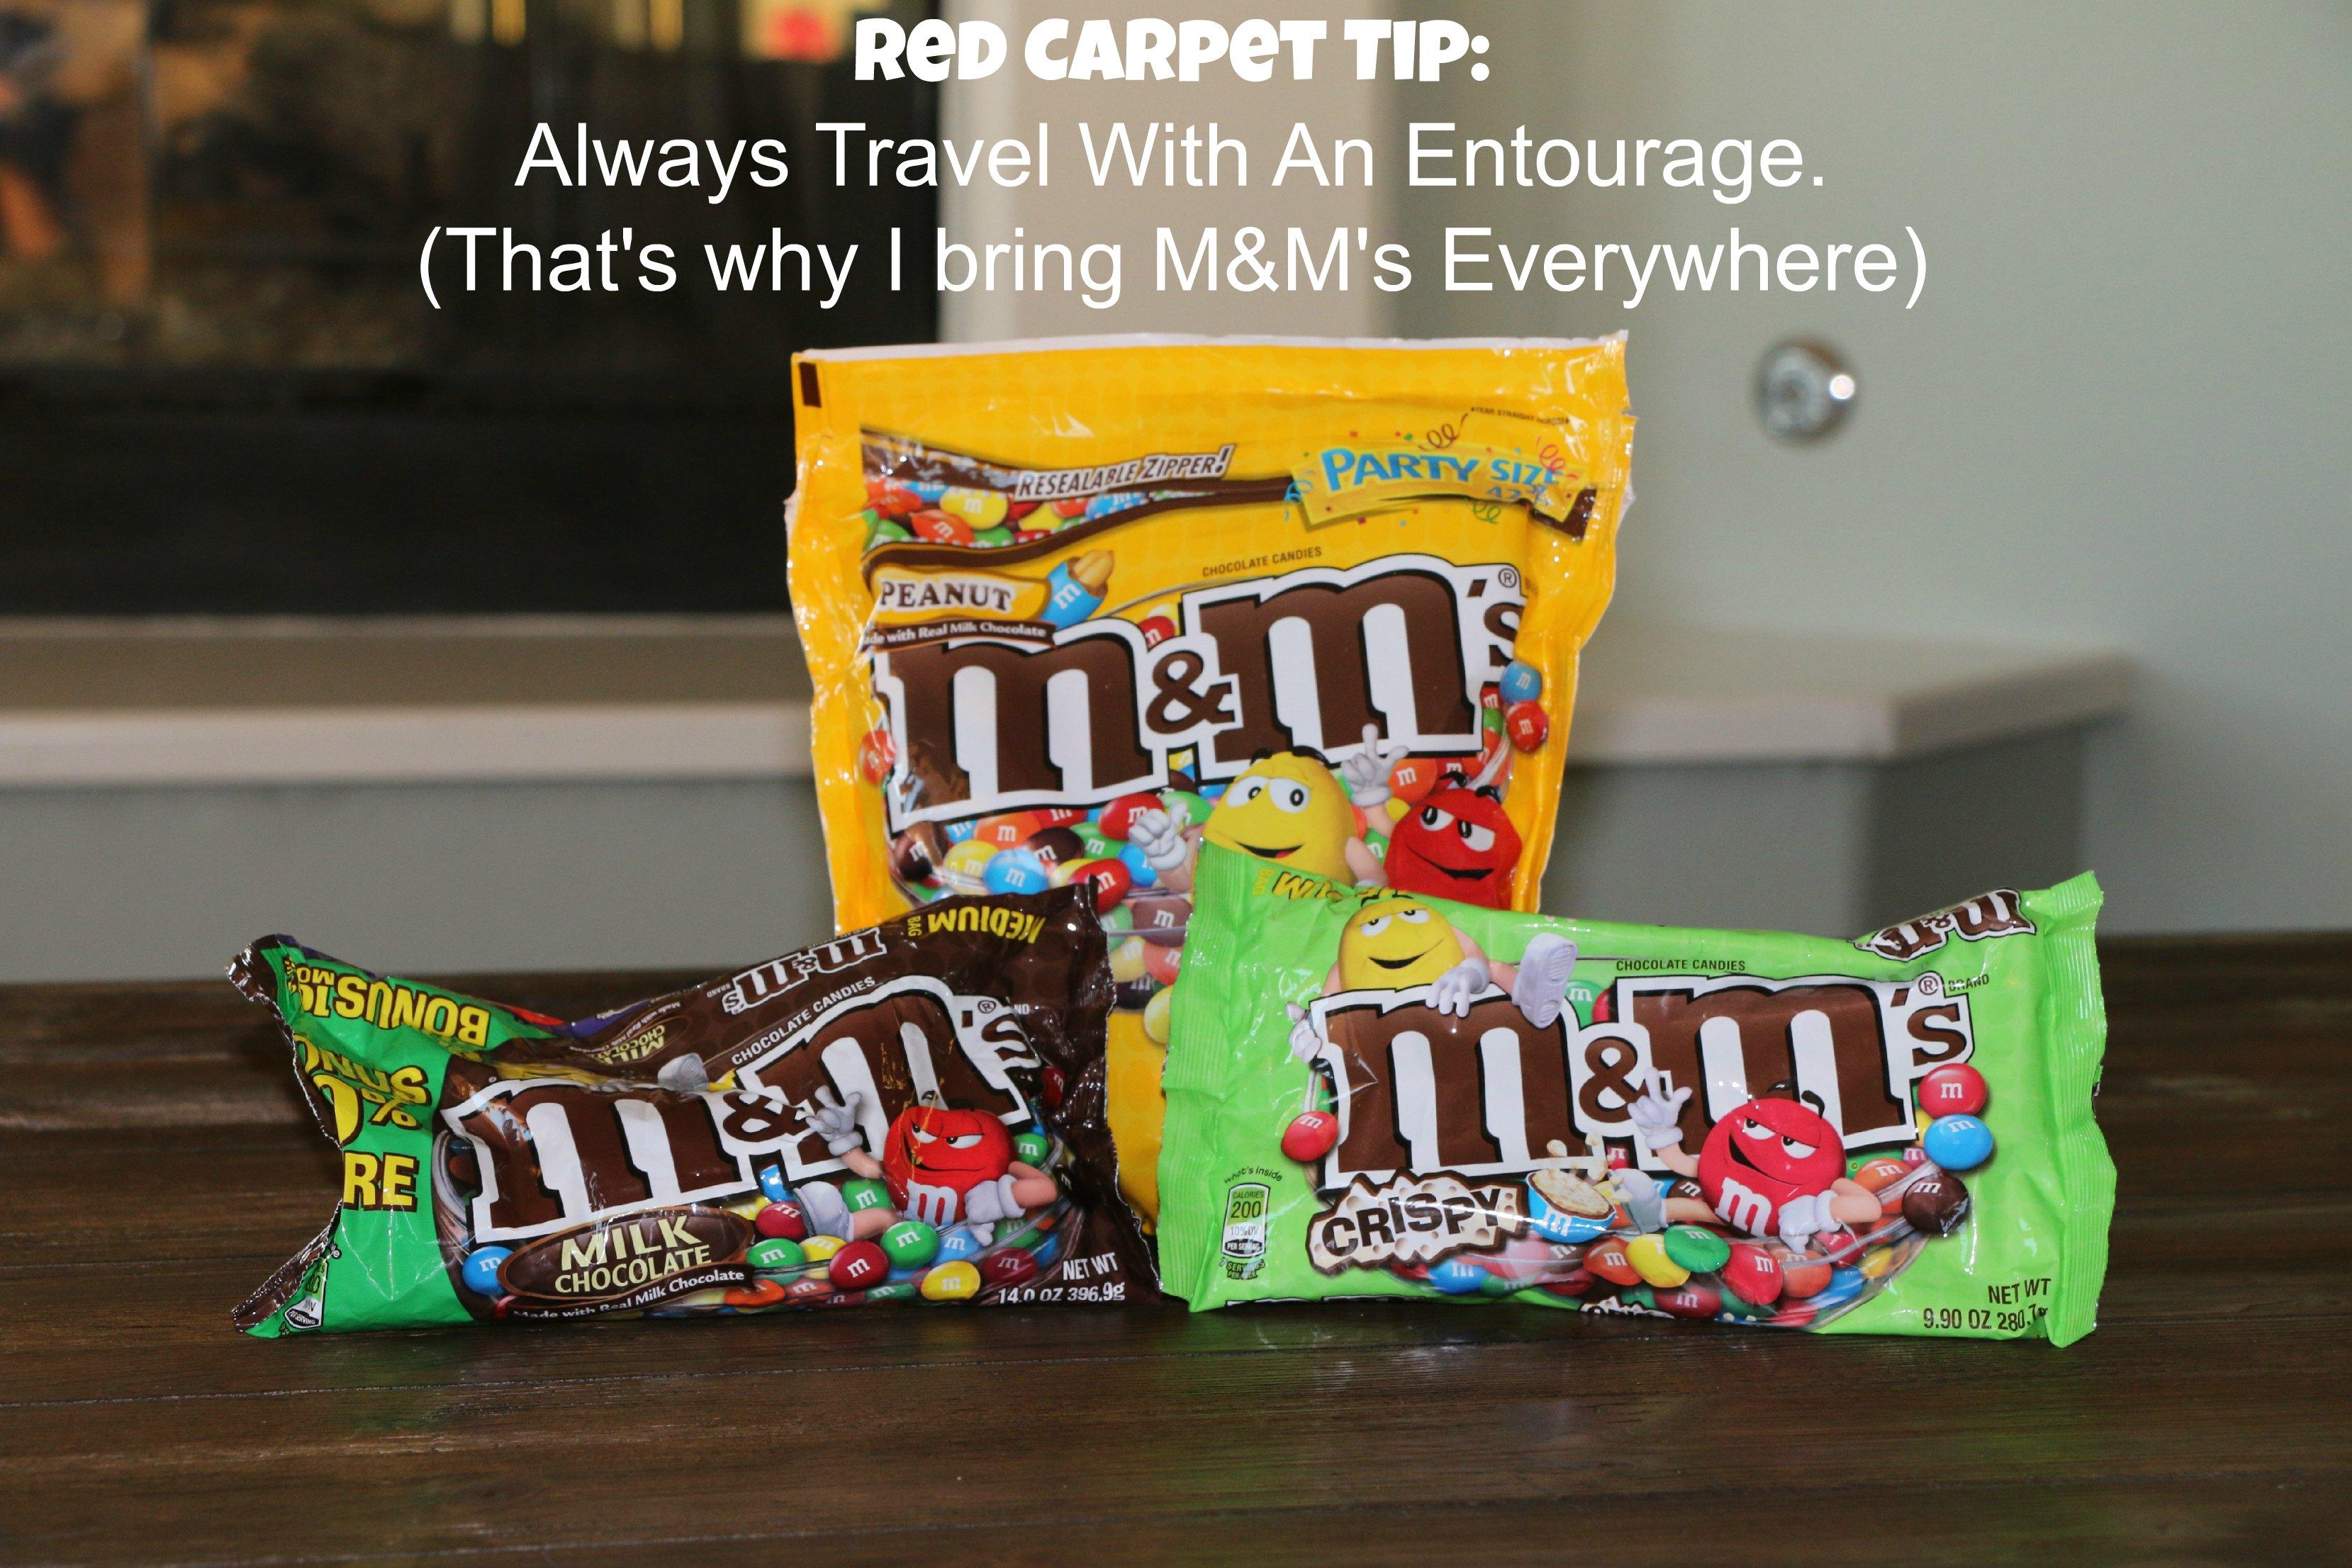 red carpet tips